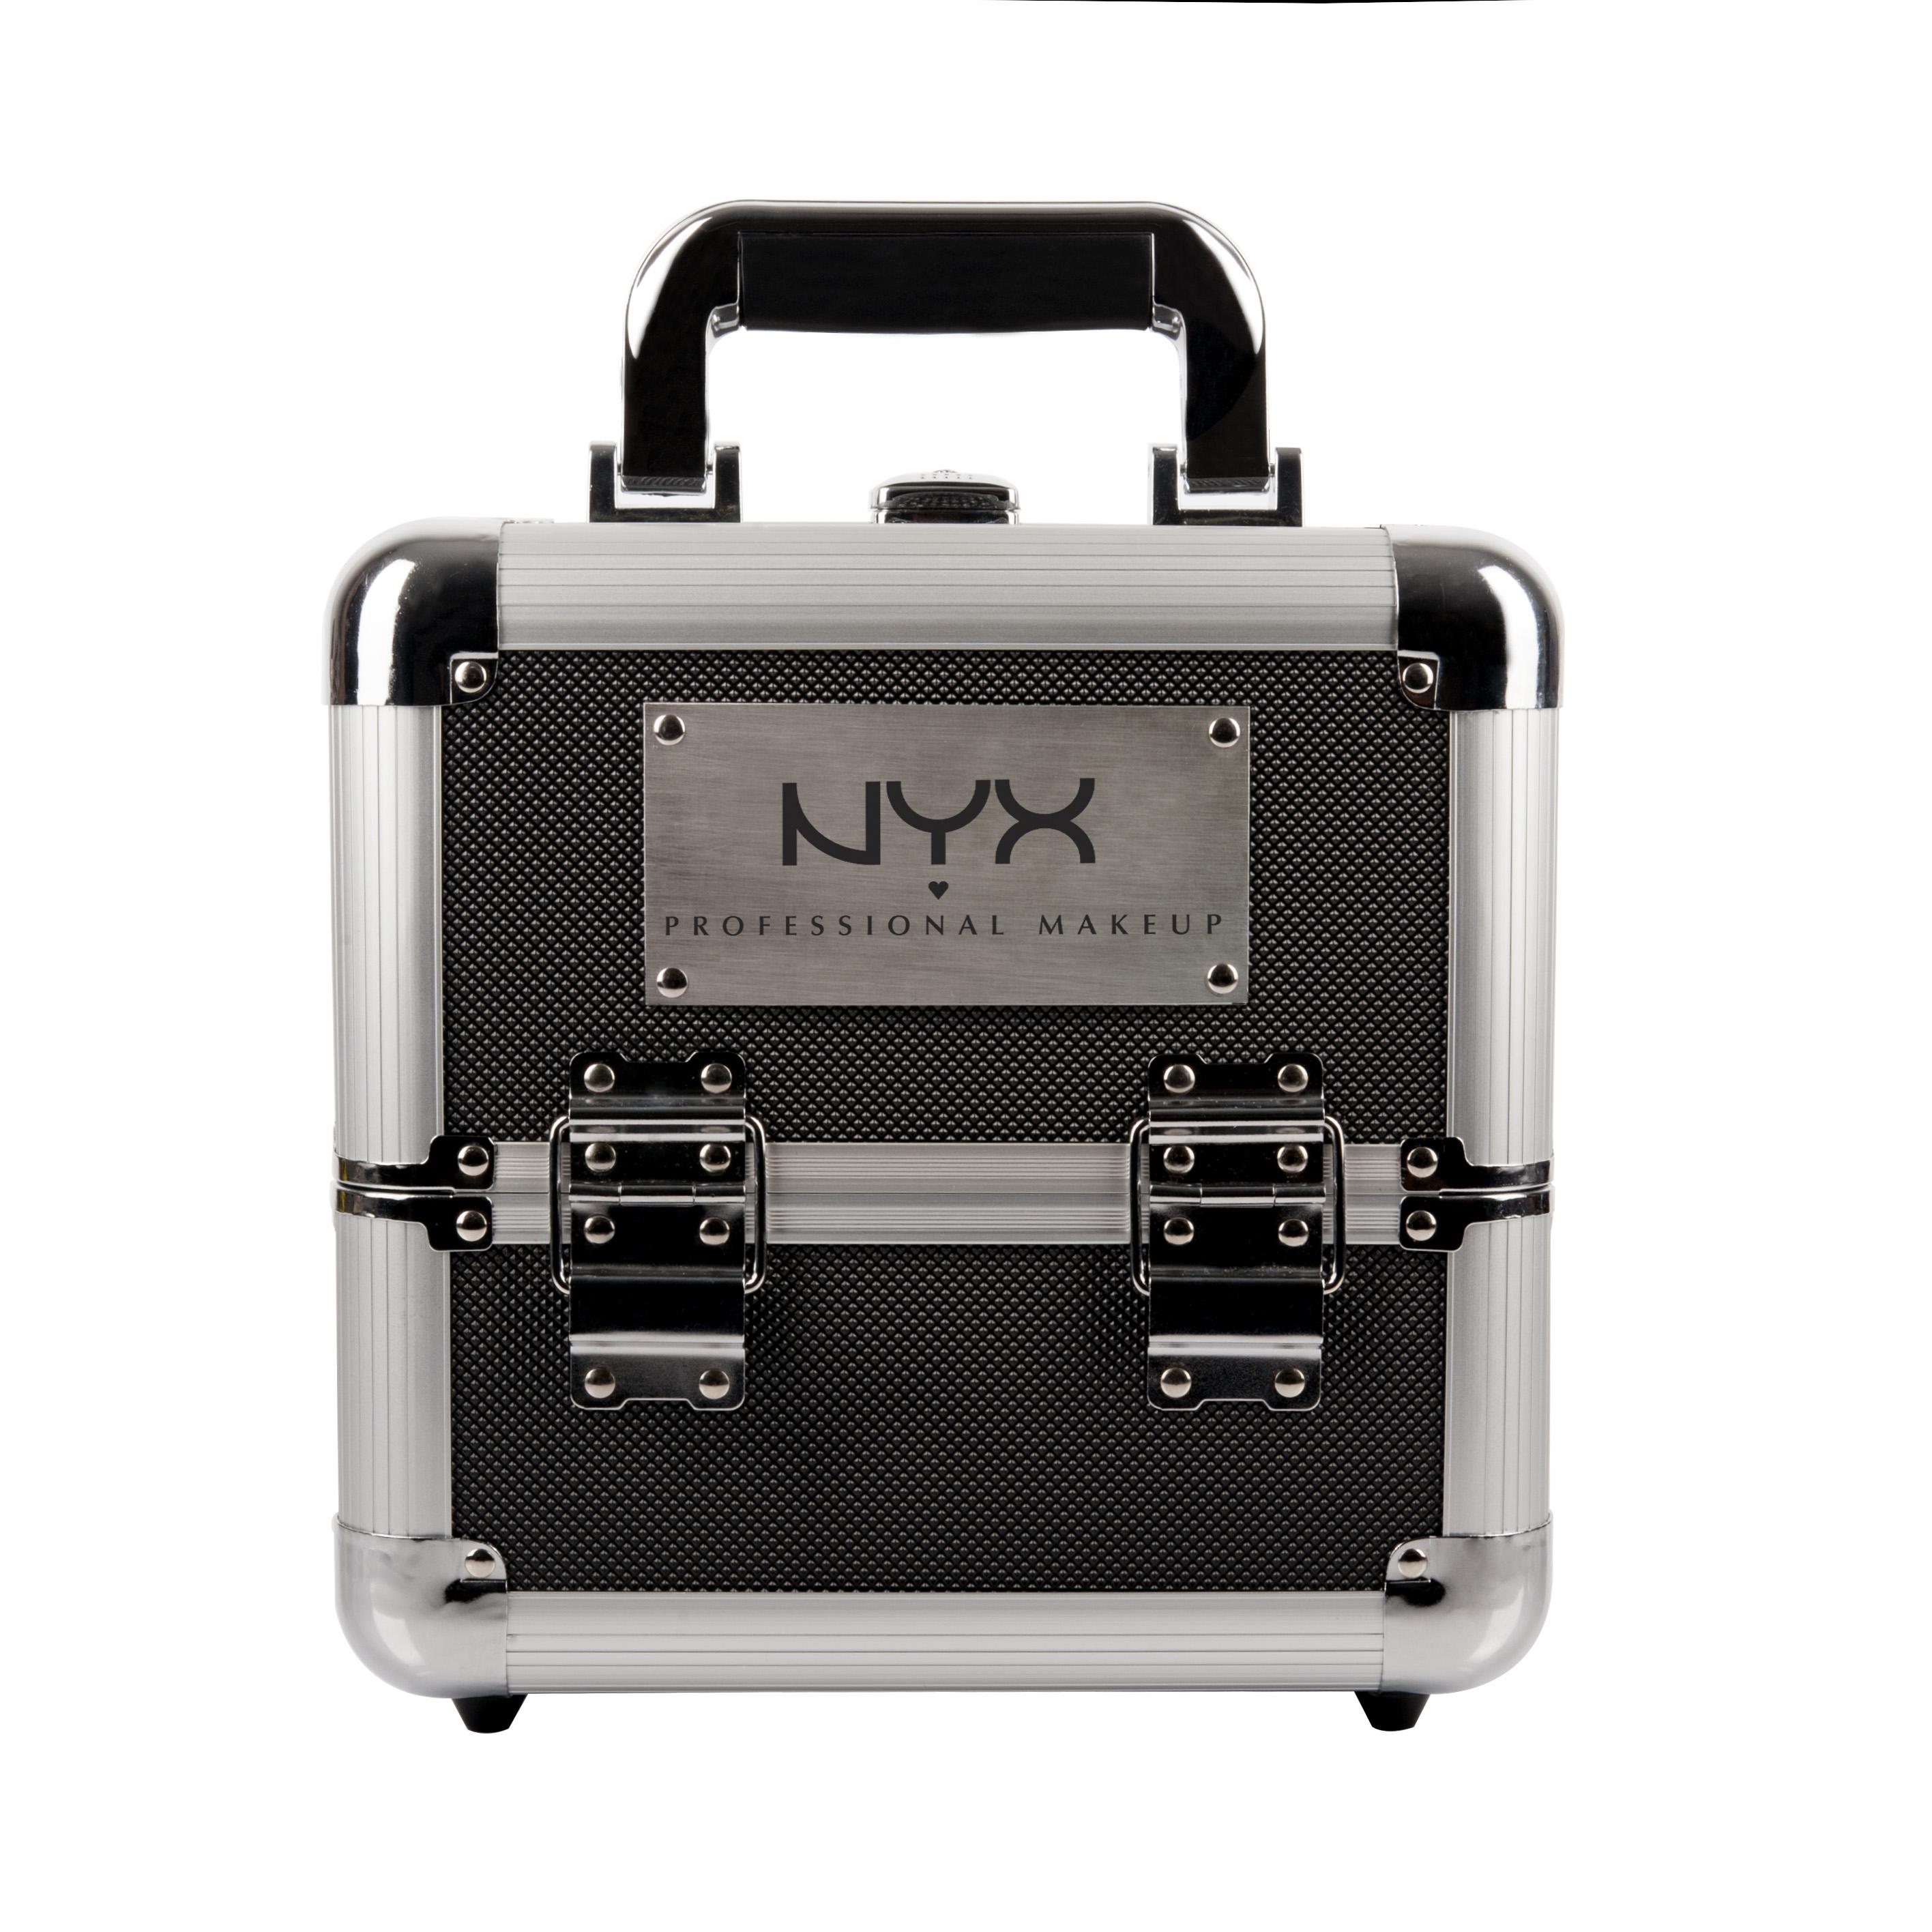 NYX Professional Makeup - Artist Train Case - Beginner